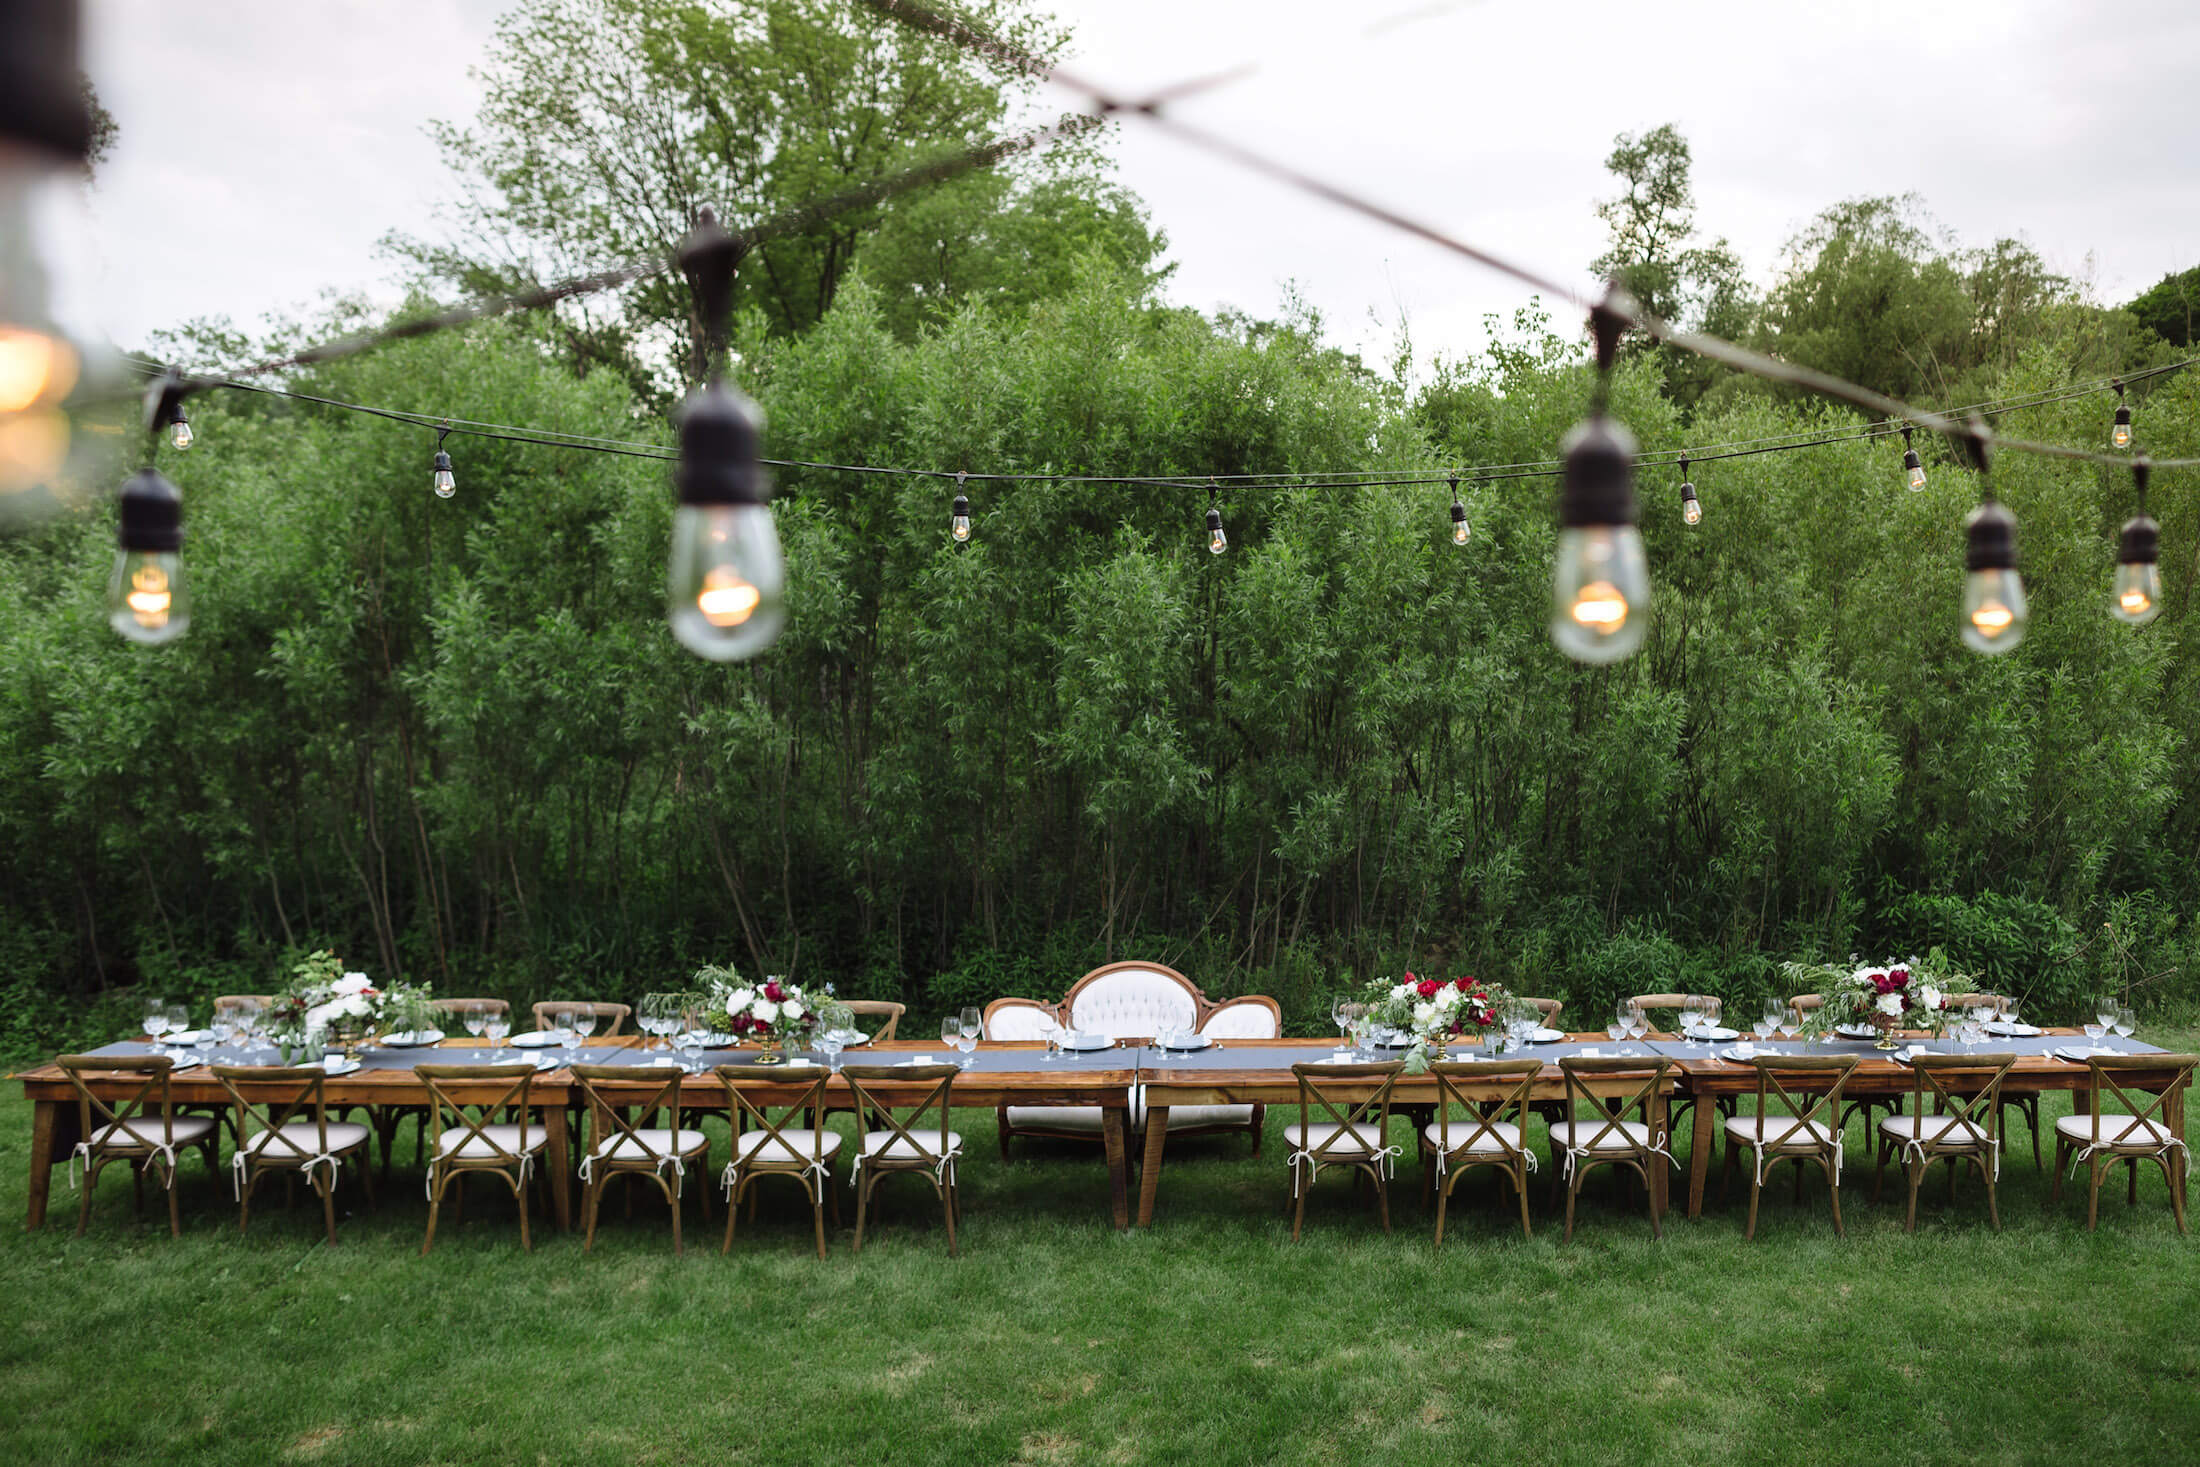 engle-olson-ray-kelly-photography-wisconsin-wedding-98.jpg